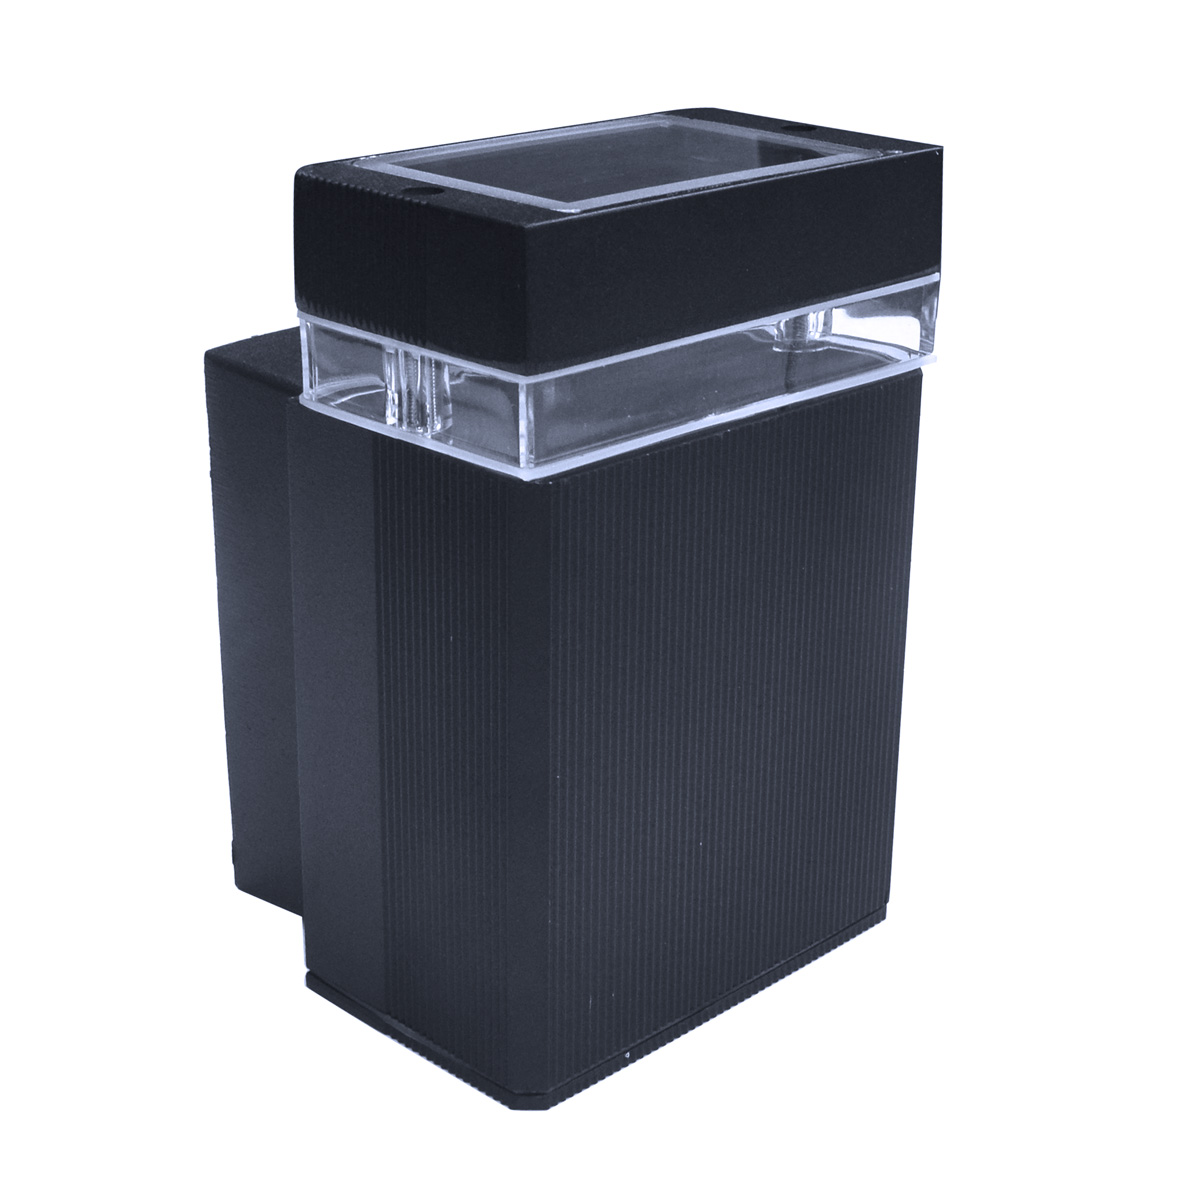 Jiawen מודרני חוצות מים IP65 אלומיניום קיר - תאורה חיצונית